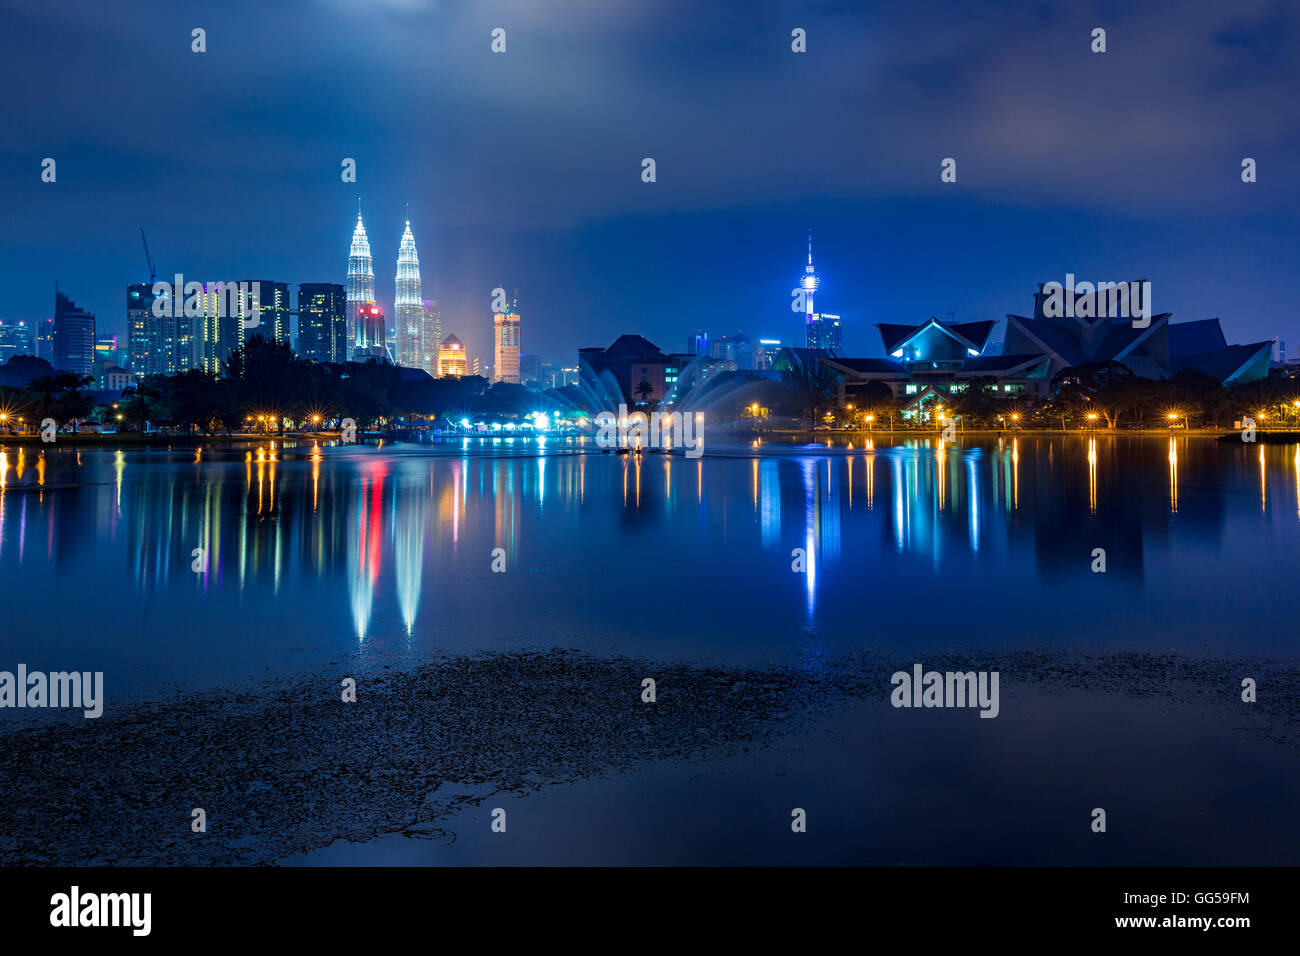 Kuala Lumpur skyline at night as seen from Titiwangsa Lakes, Kuala Lumpur, Malaysia Stock Photo